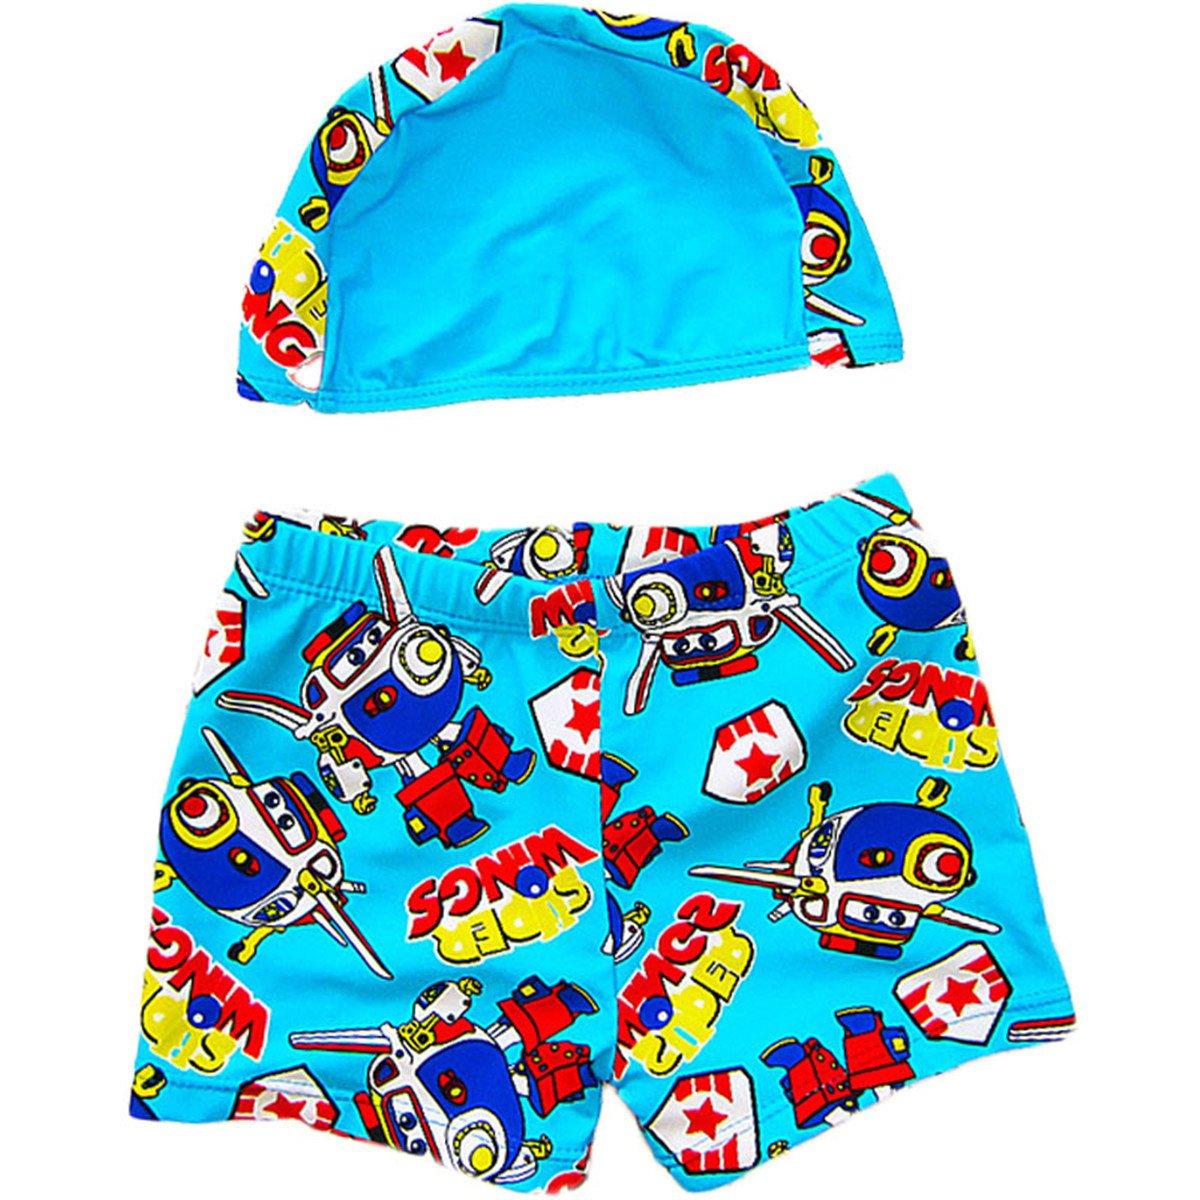 JELEUON Baby Kids Infants Toddler Boys Cute Cartoon Swimming Trunks Beach Short Pants With Cap